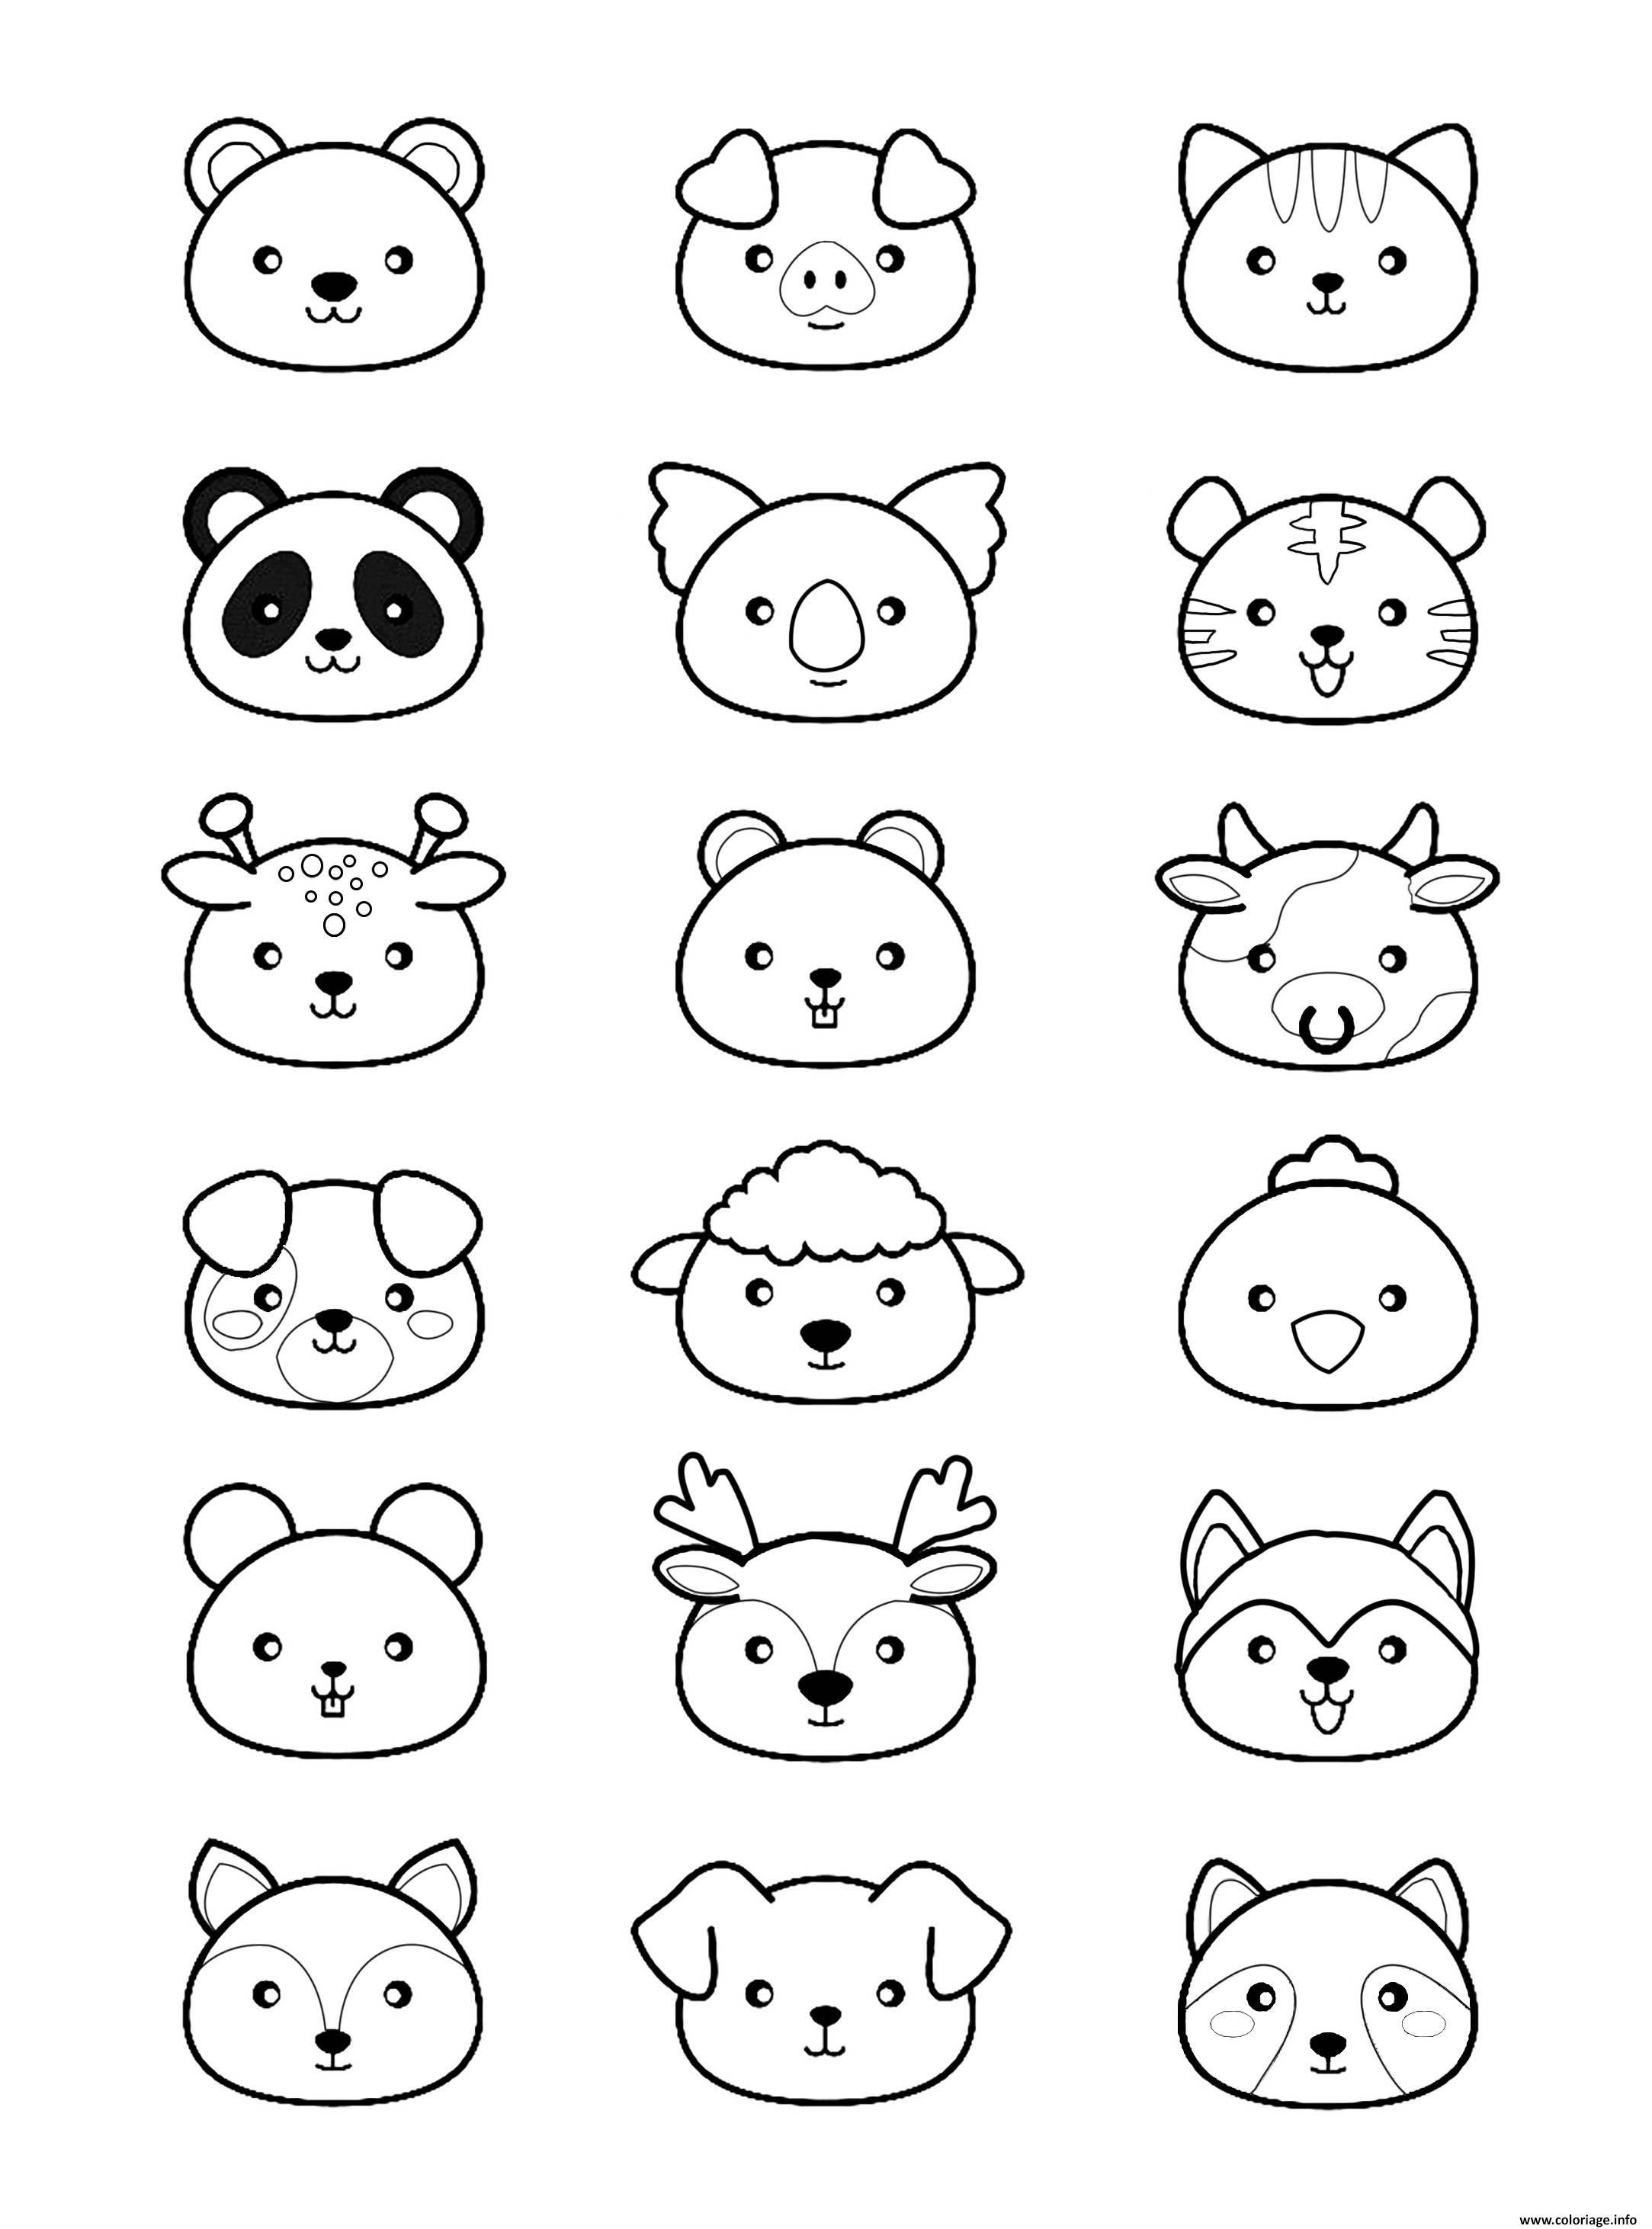 Coloriage Kawaii Panda.Dessin A Imprimer Chat Kawaii Vedkokeven Blogspot Com